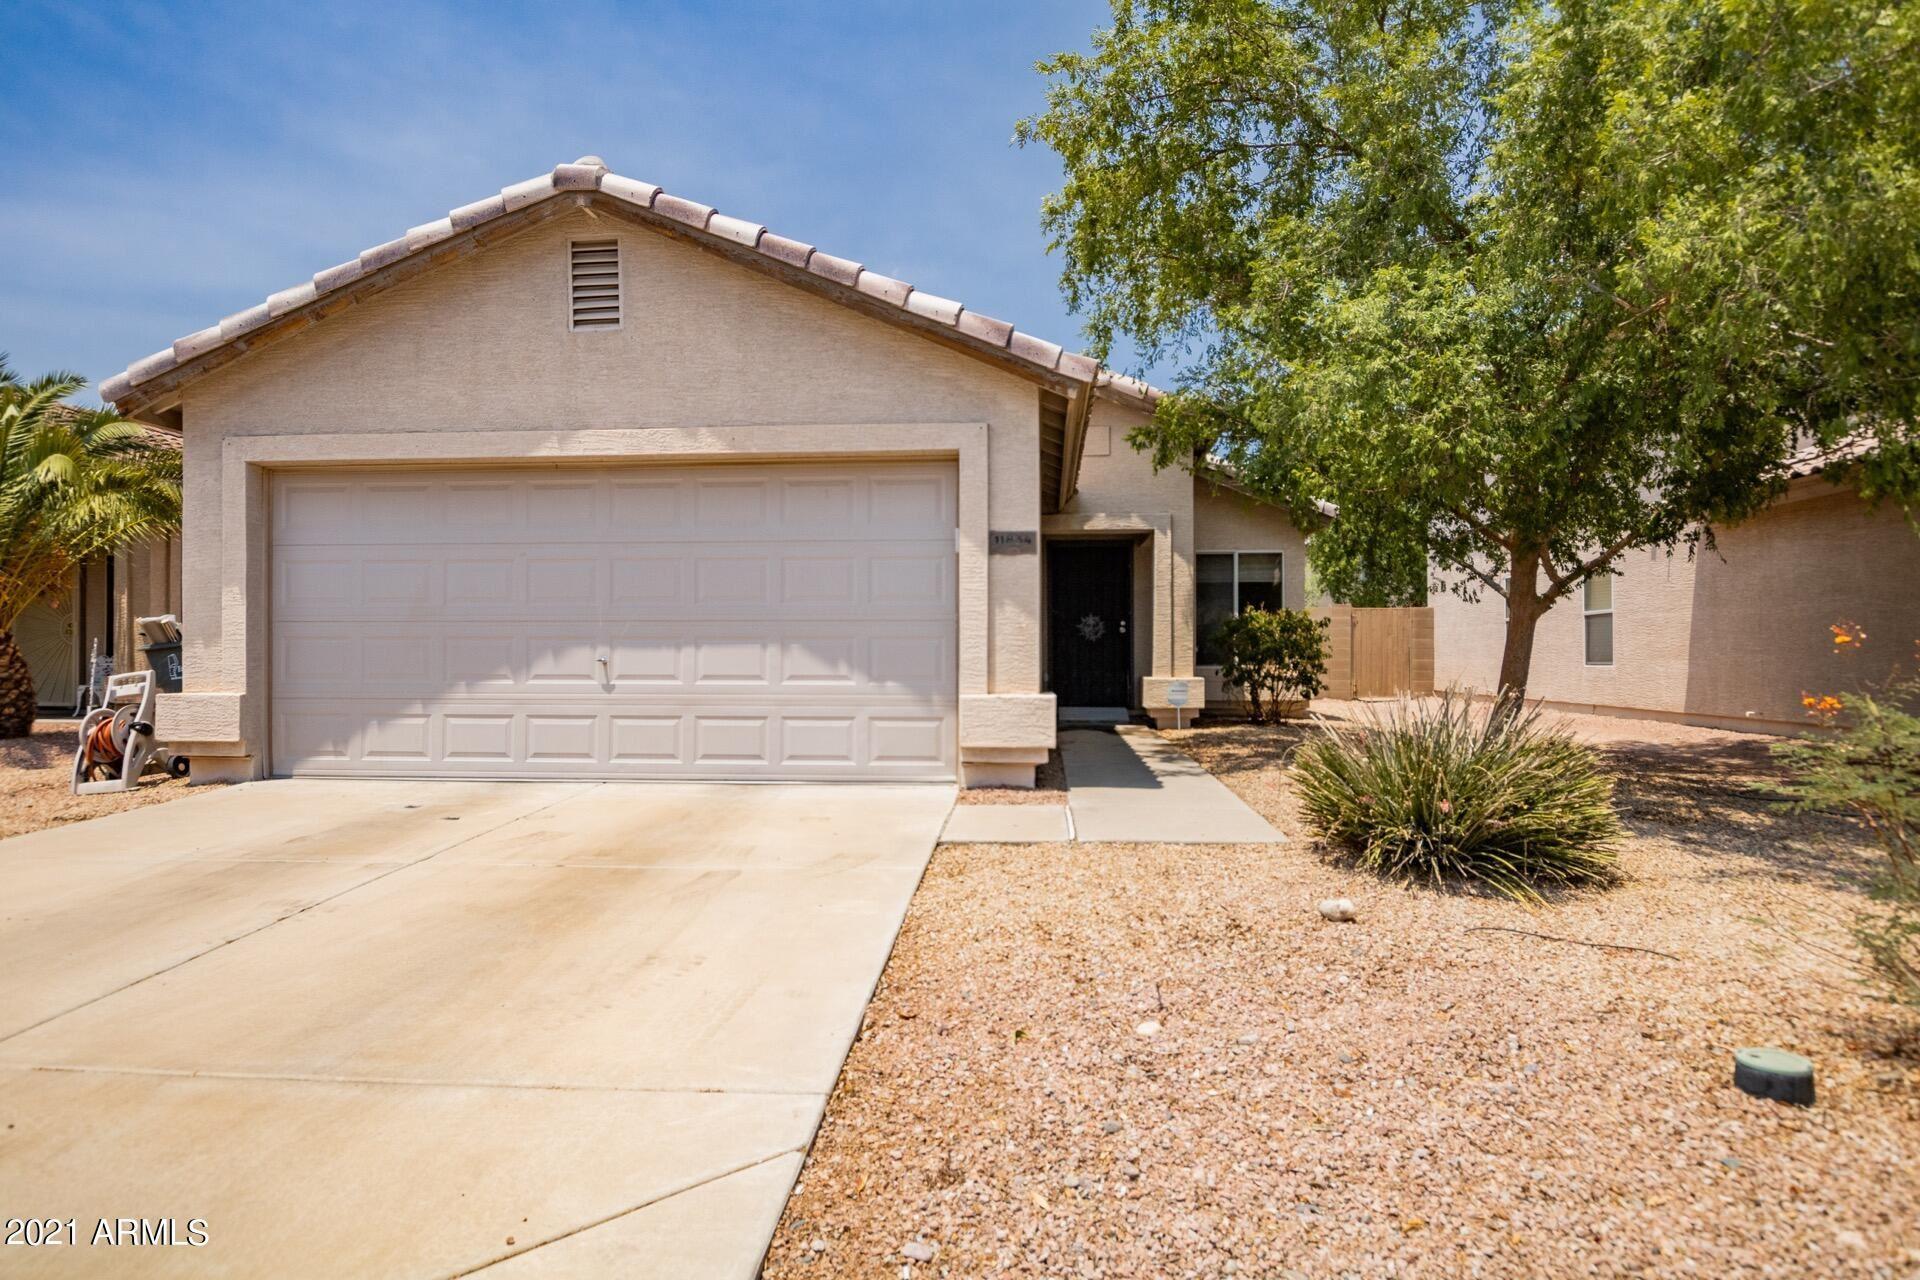 Photo of 11834 W LAUREL Lane, El Mirage, AZ 85335 (MLS # 6263565)